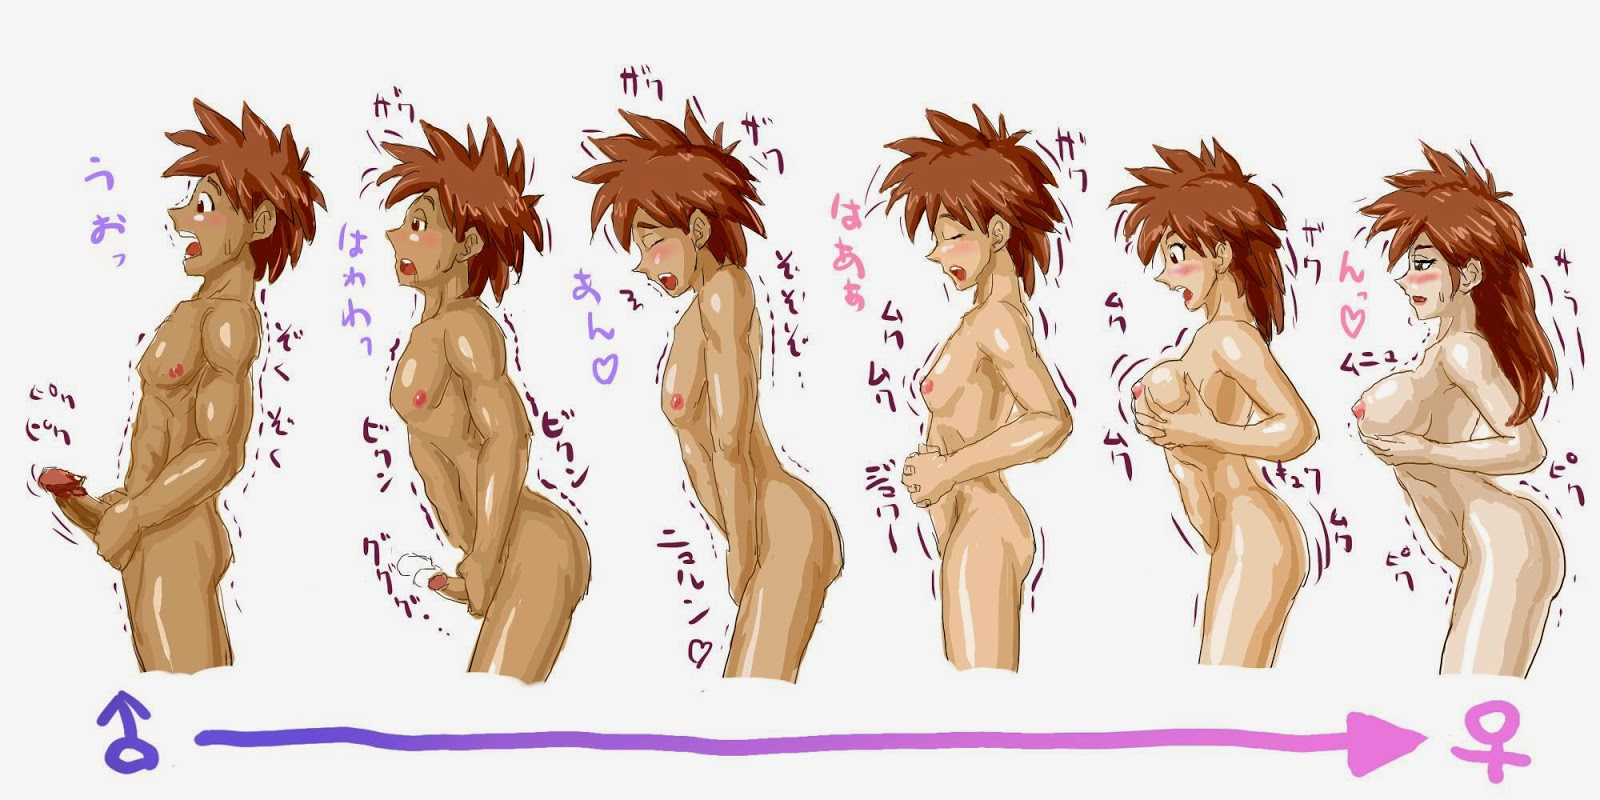 AND www gender bender hentai naked com